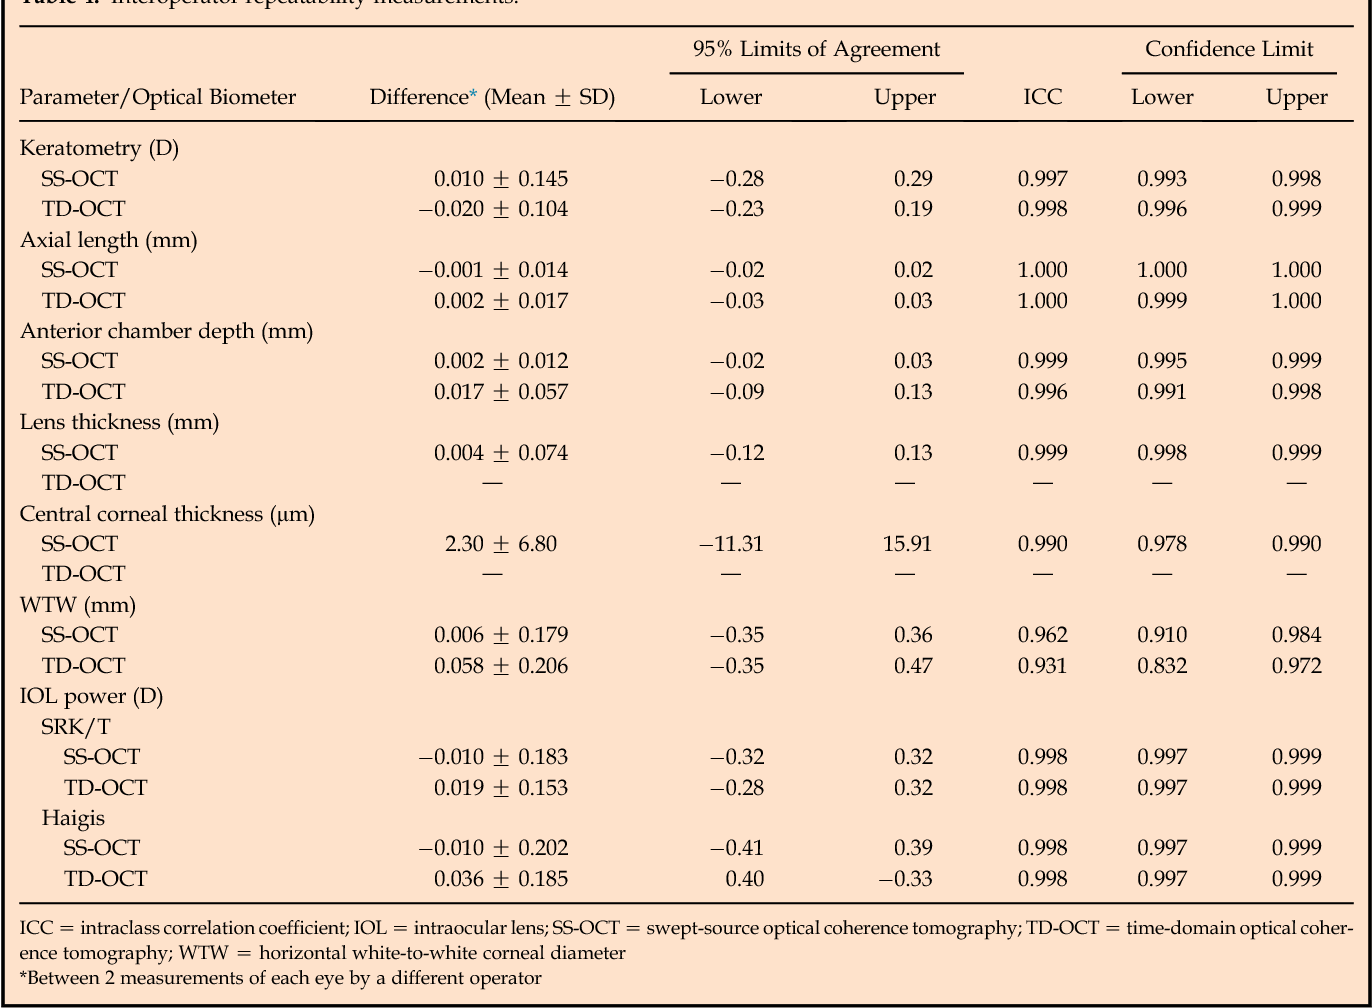 Table 4. Interoperator repeatability measurements.